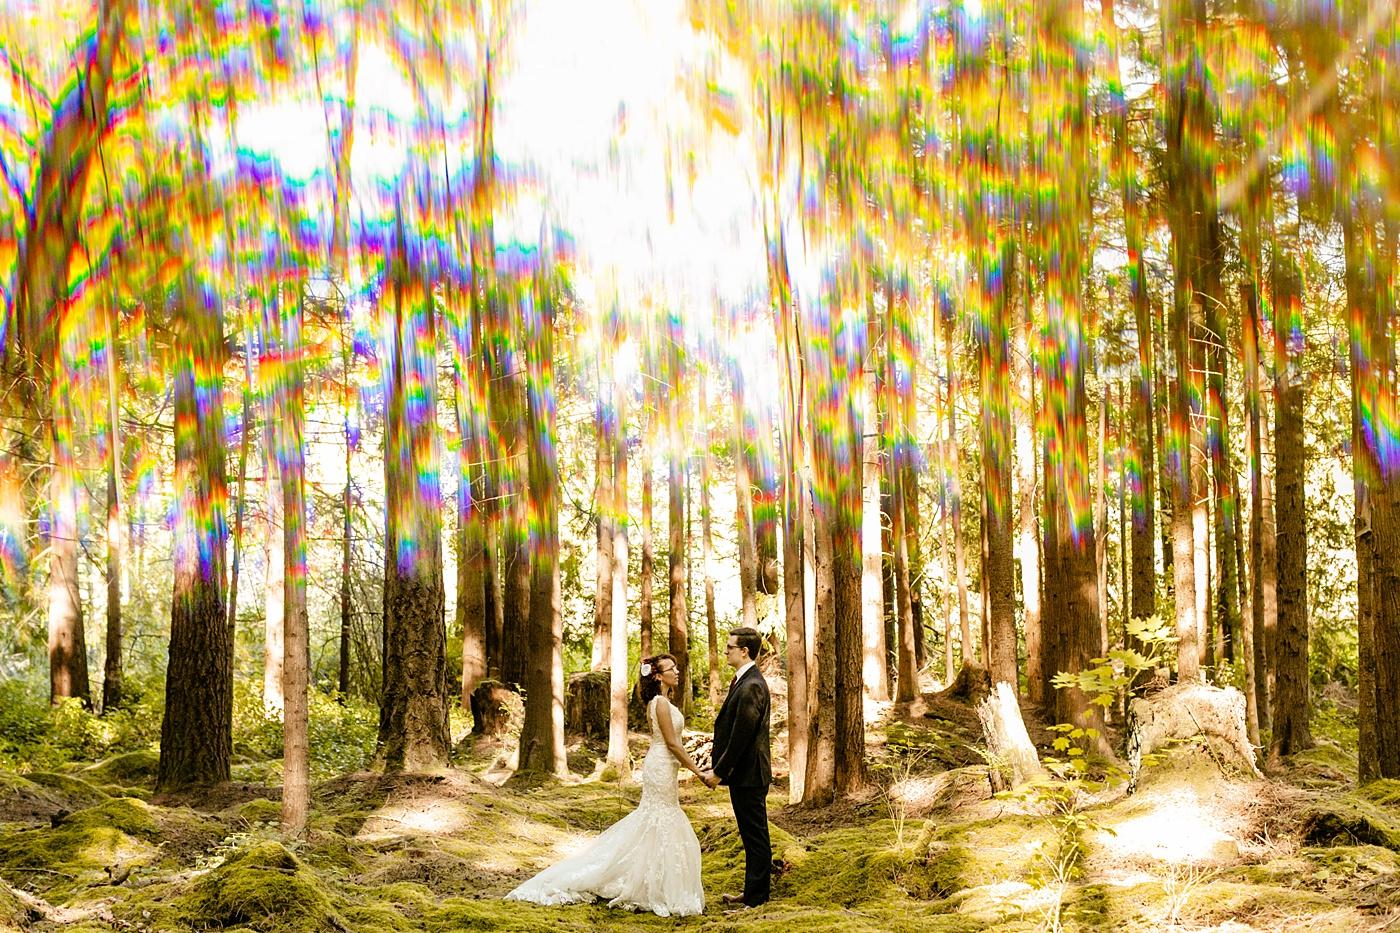 How To Choose The Best Wedding Vendors, unique wedding photo idea, prism, seattle elopement photographer, emerald forest